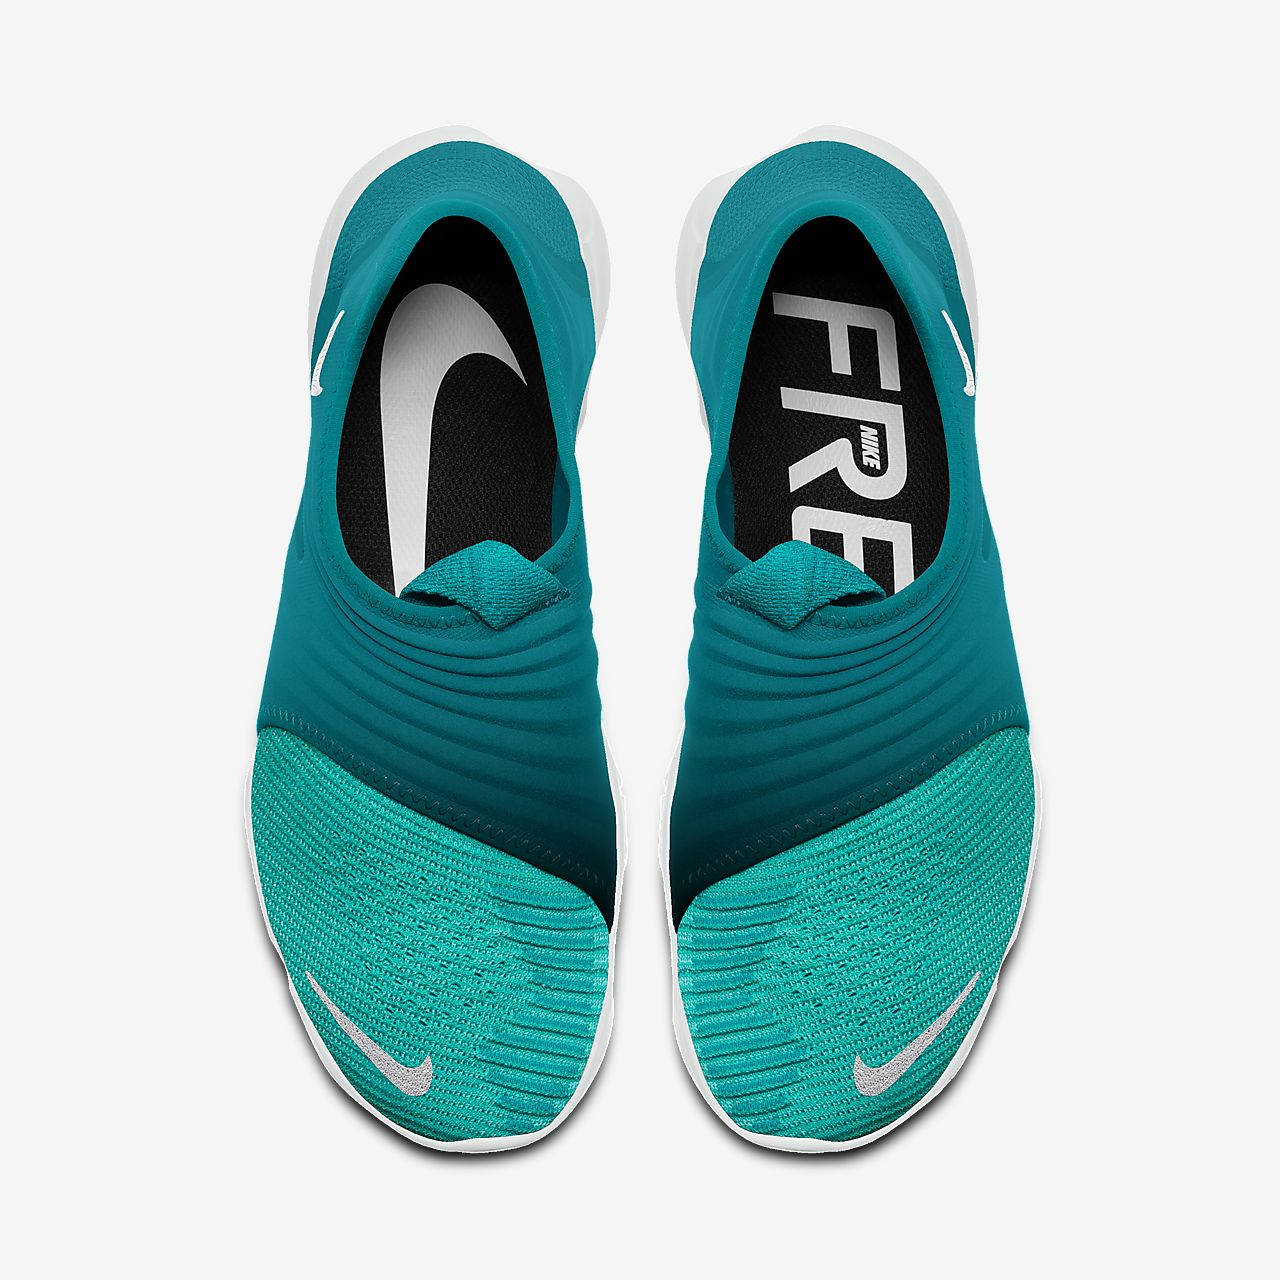 Nike Free RN Flyknit 3.0 By You personalisierbarer Damen Laufschuh